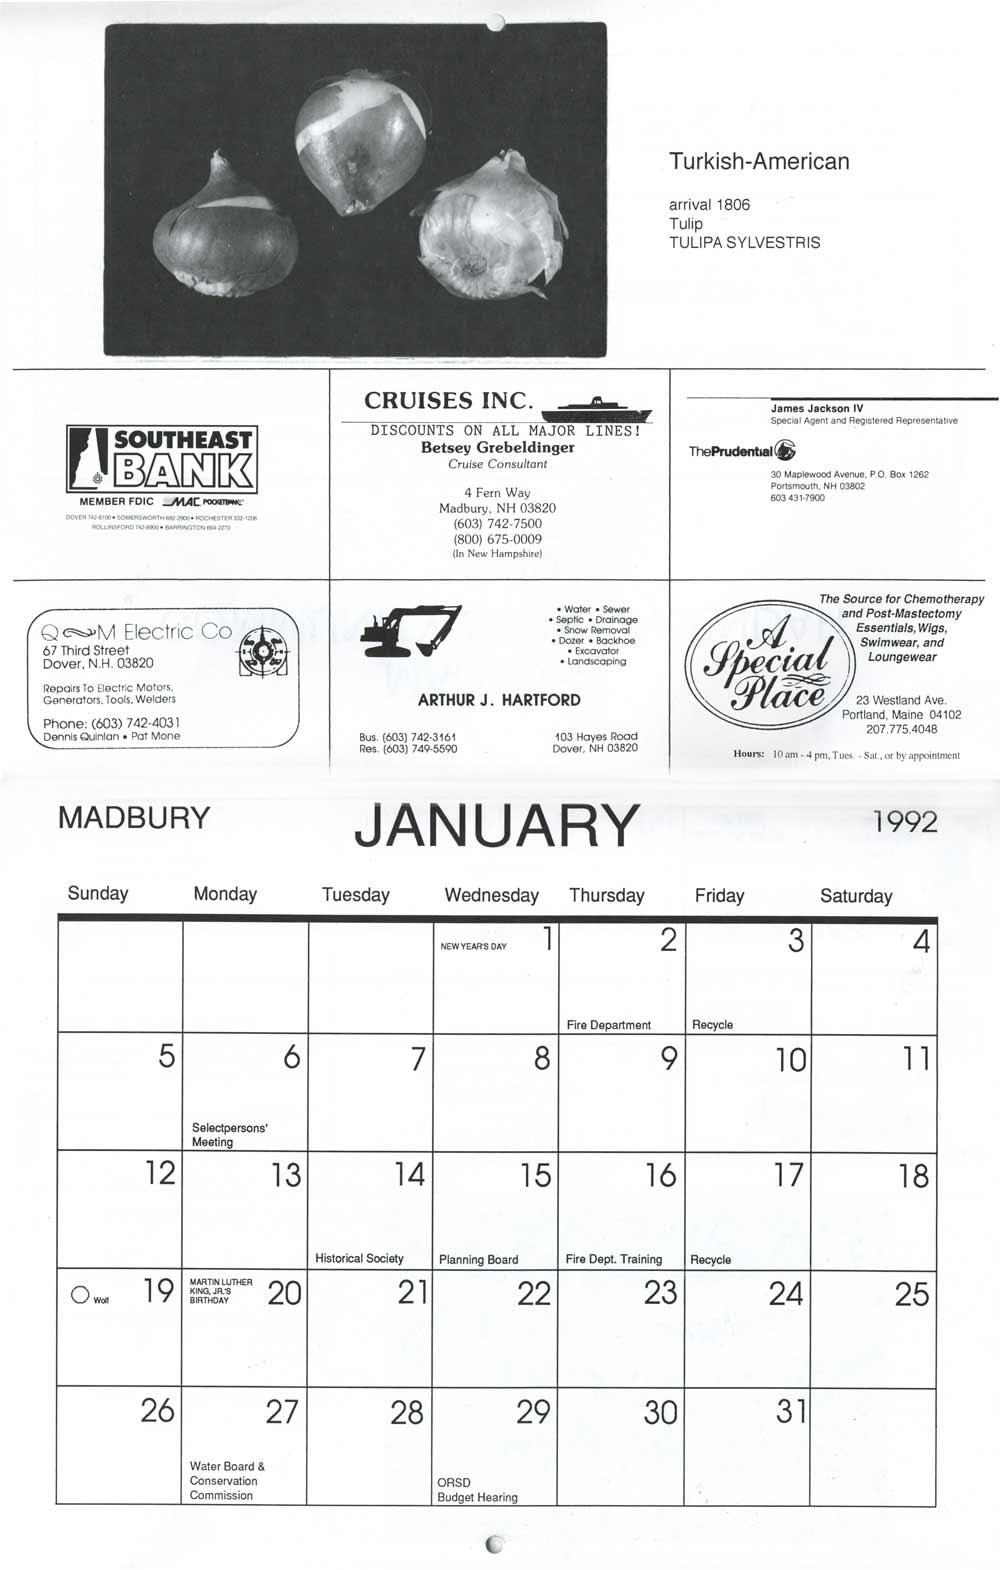 Madbury Calendar, pg 2